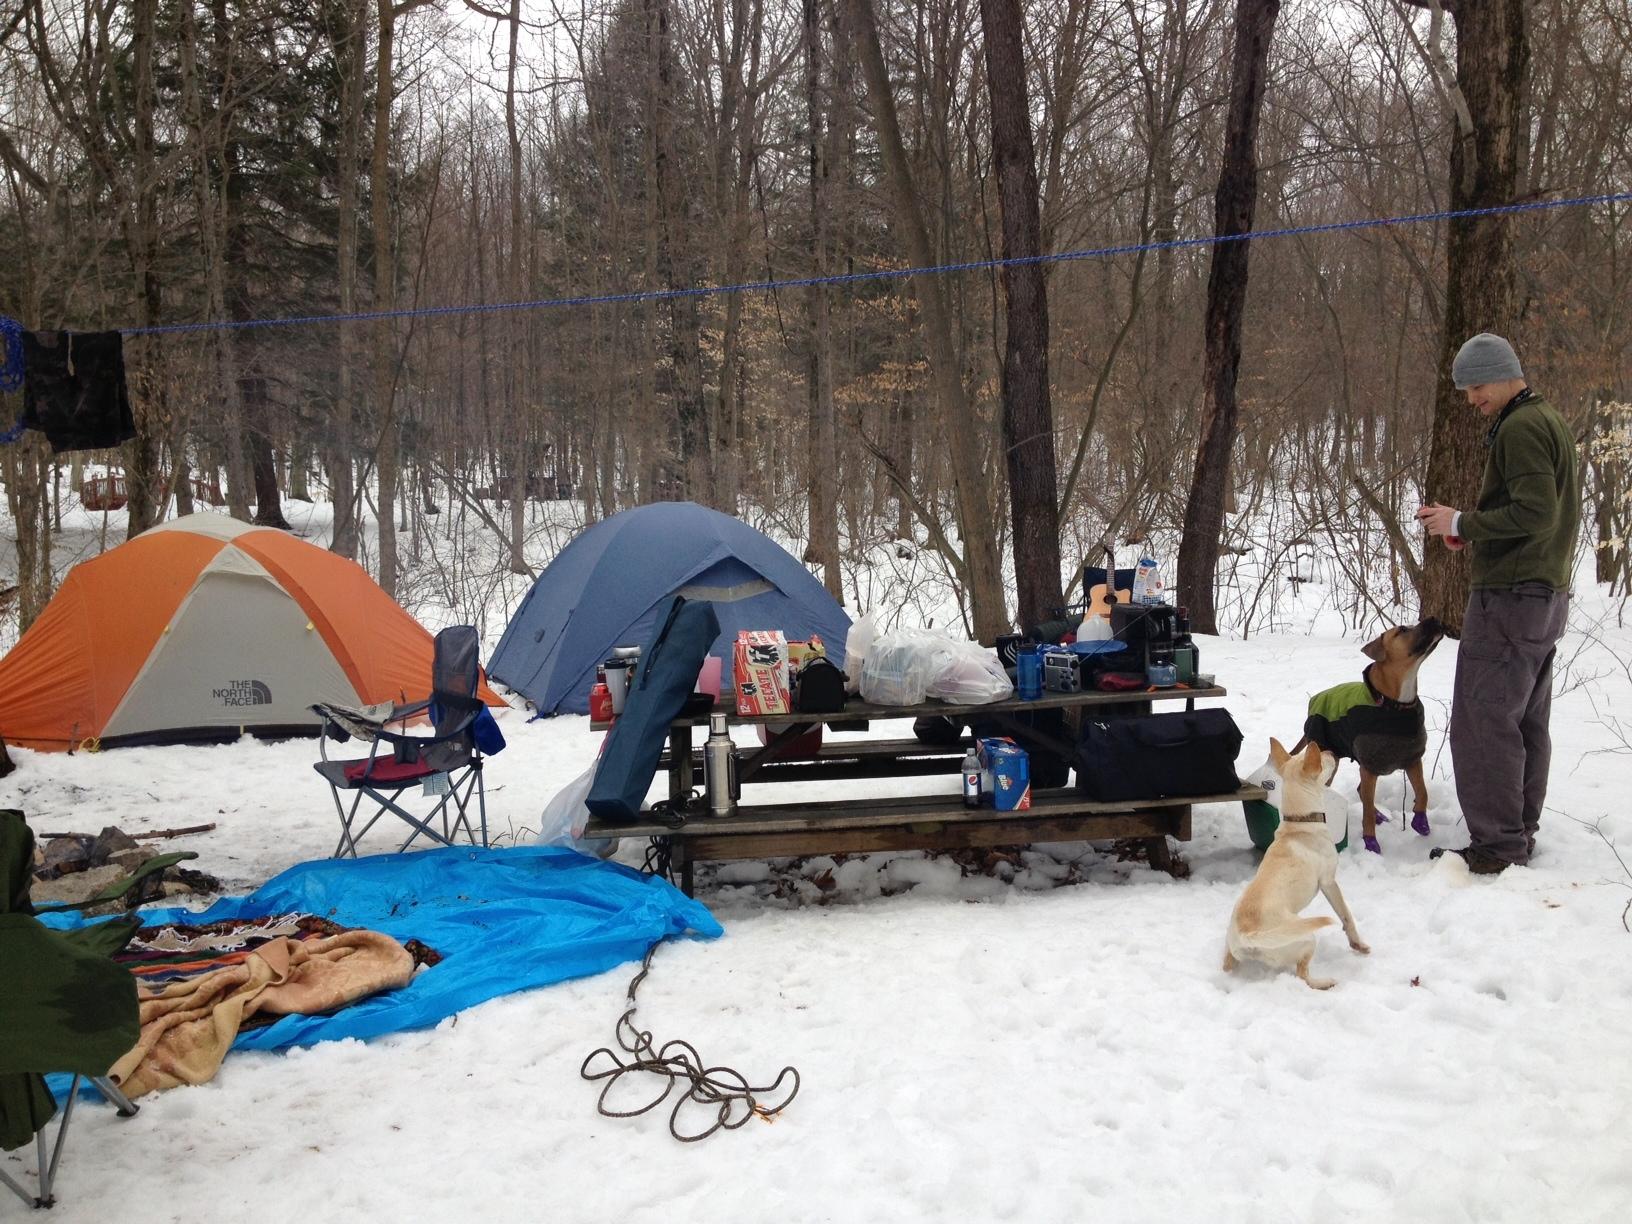 Camping Dog Bed Australia